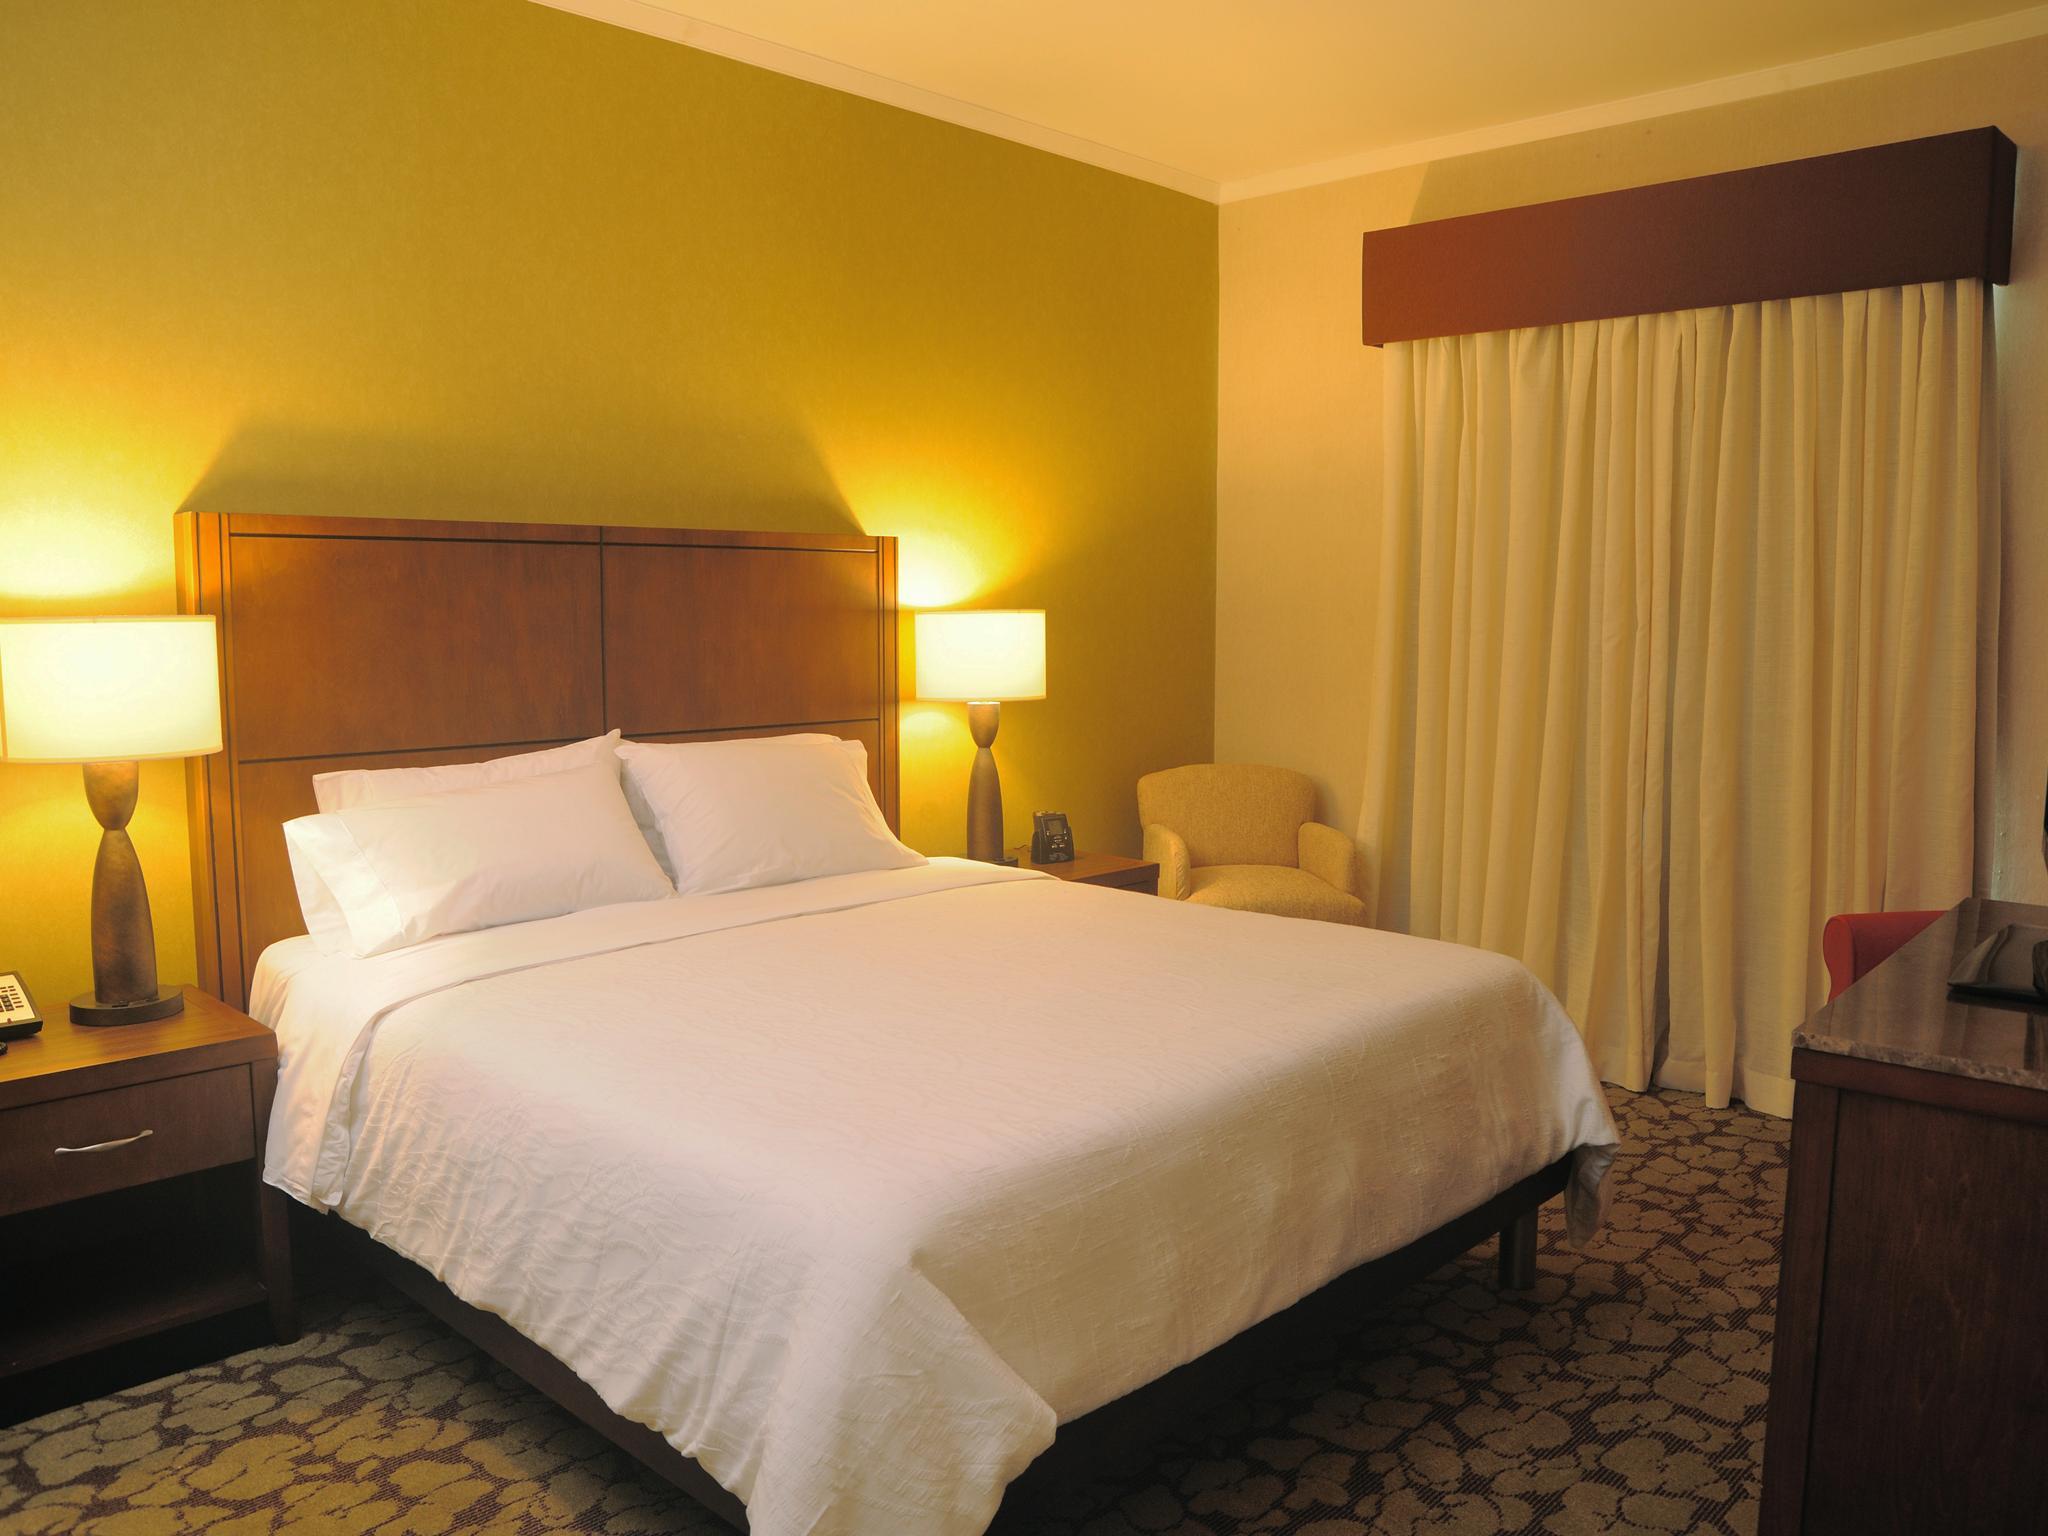 Hoteles En Panam 225 Hilton Garden Inn Panam 225